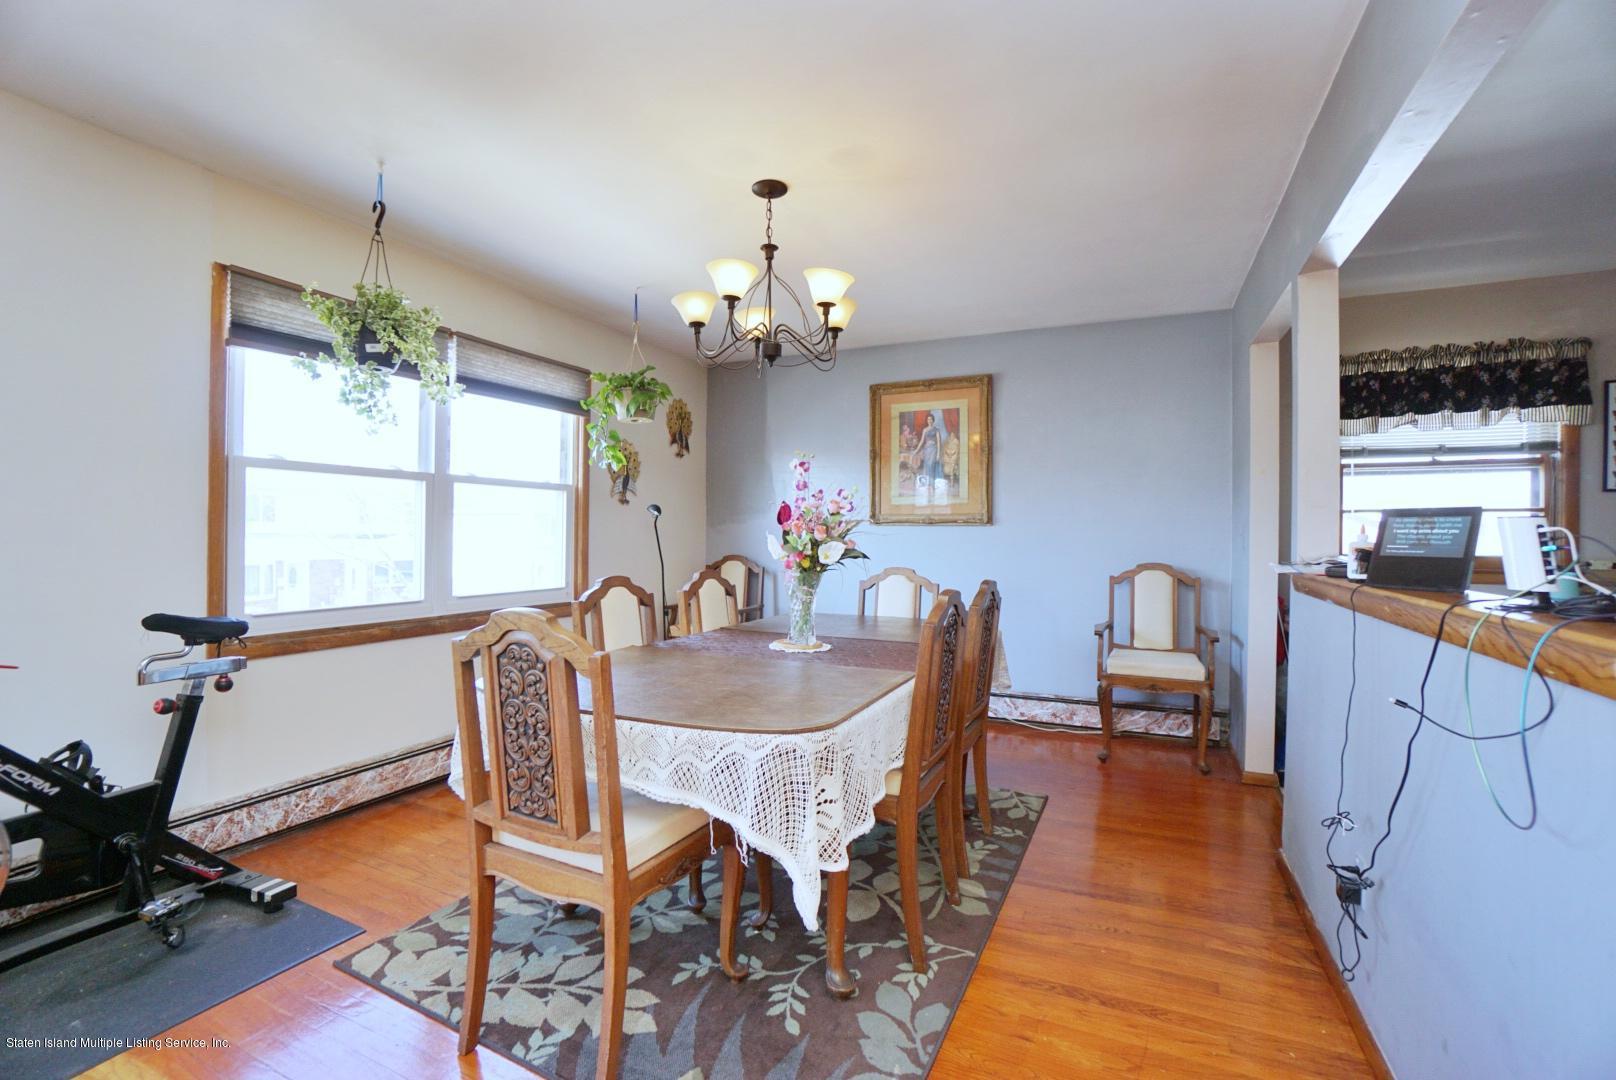 Single Family - Detached 495 Winchester Avenue  Staten Island, NY 10312, MLS-1136561-10